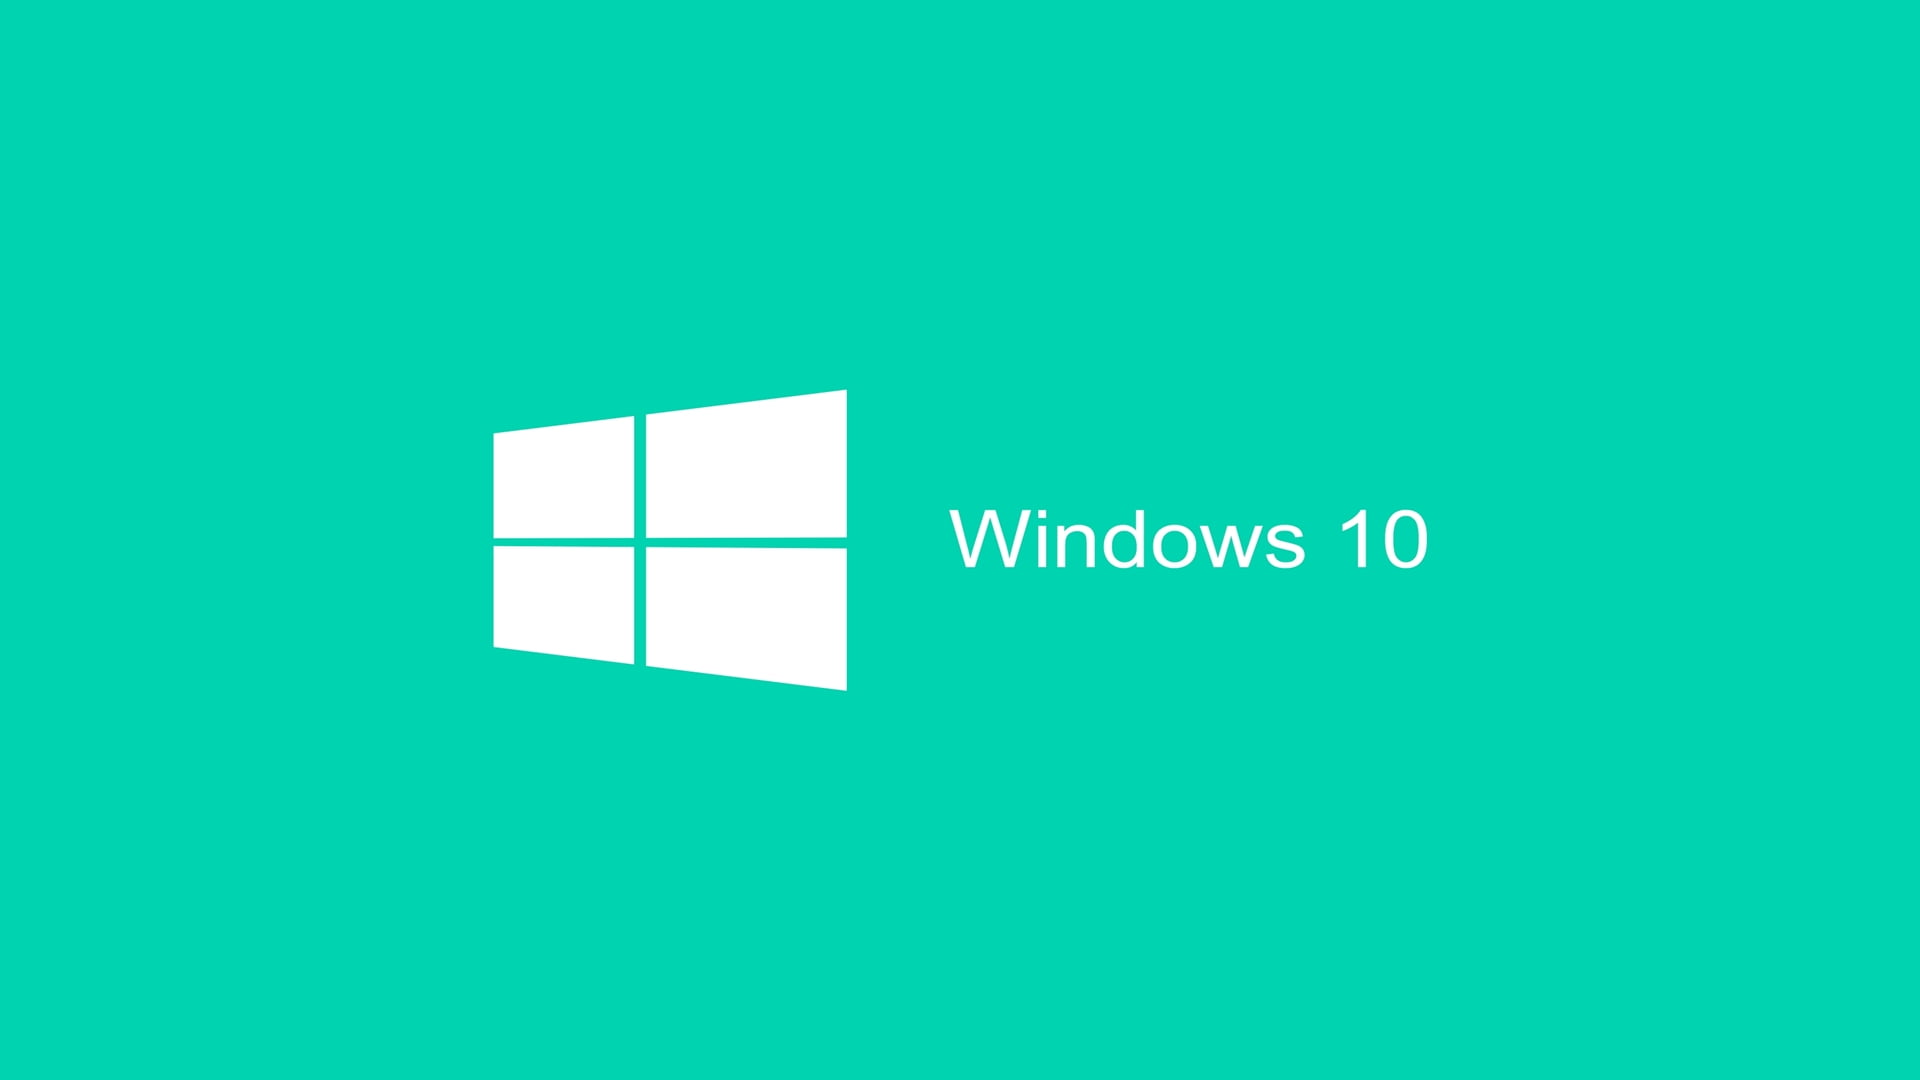 Papéis de parede do Windows 10 6